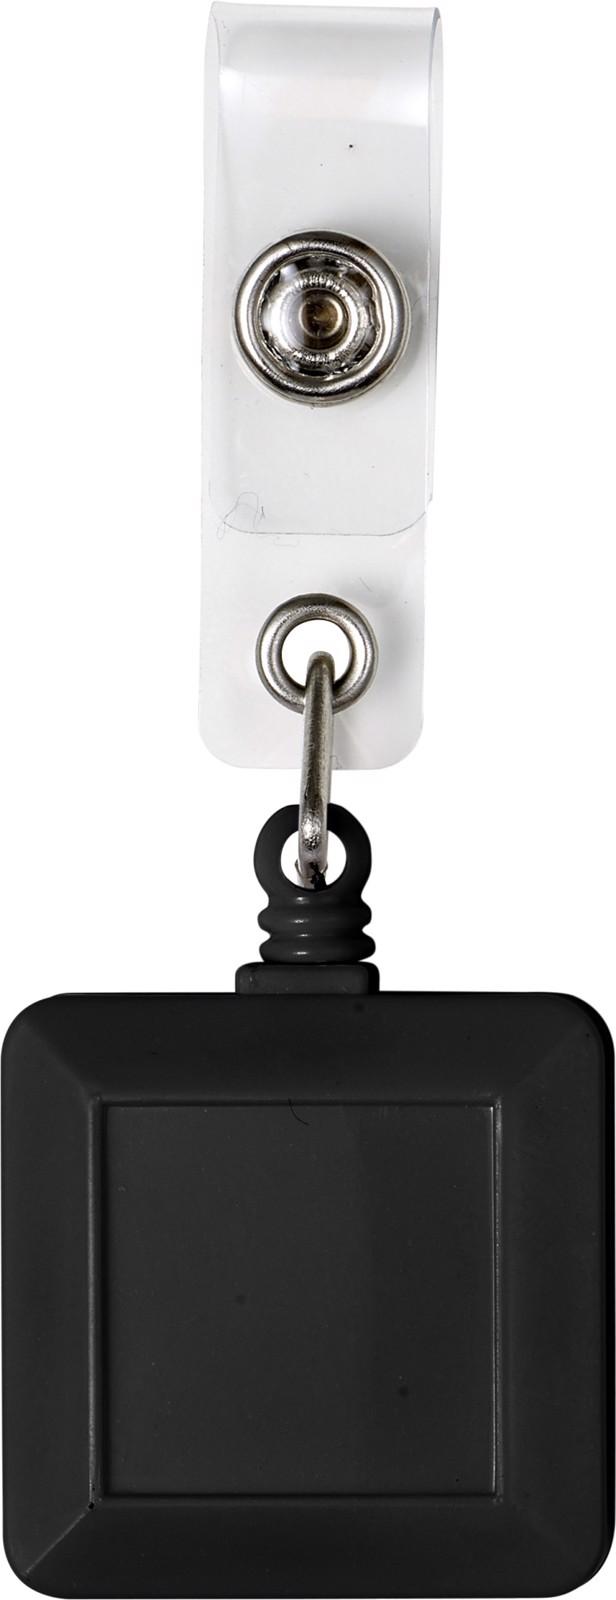 ABS name card holder - Black